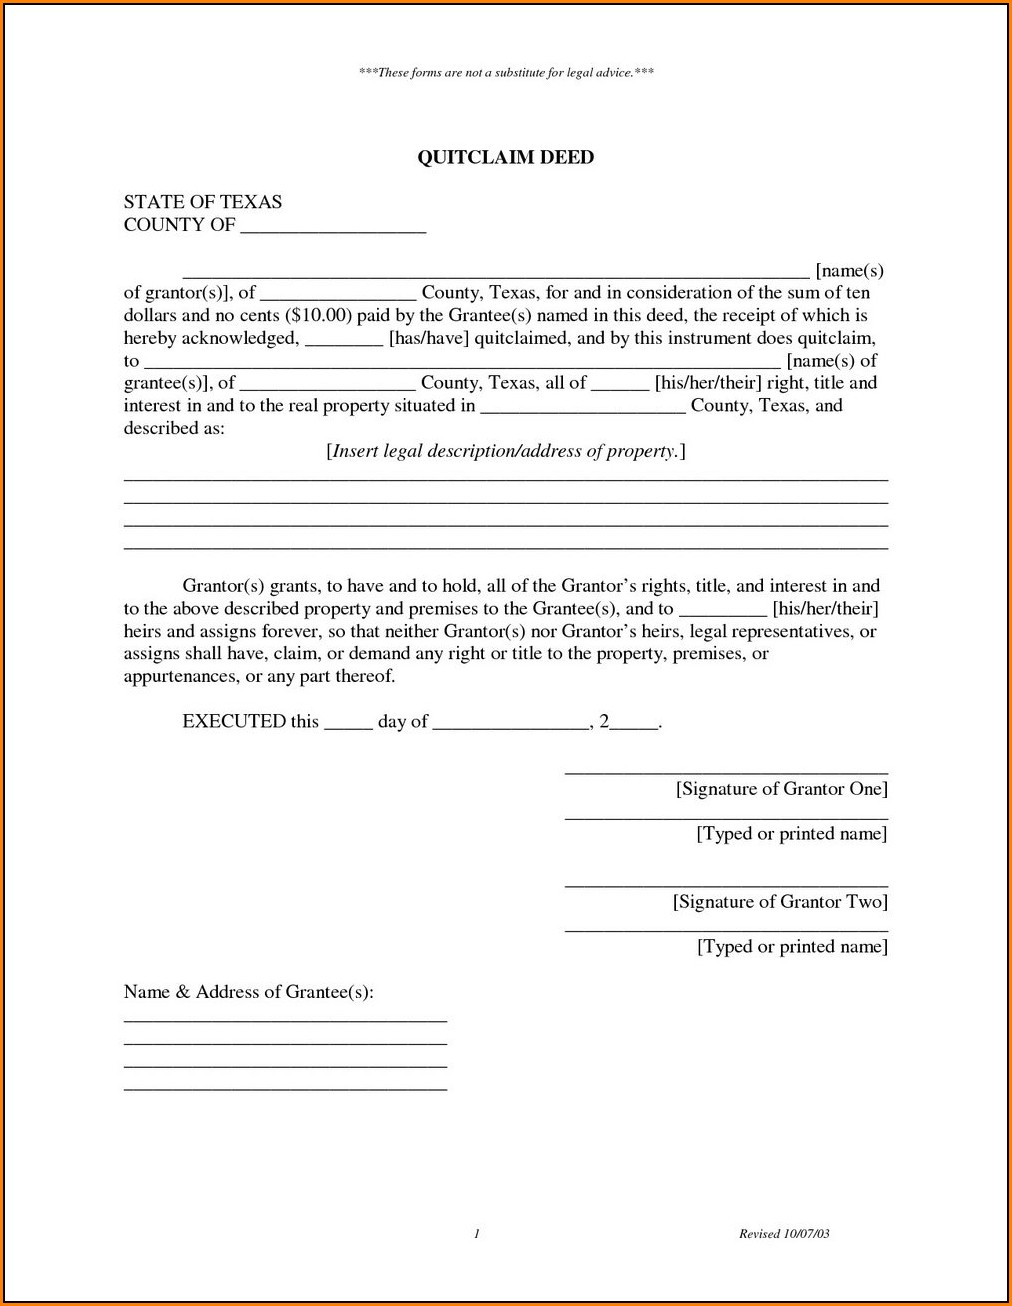 Quitclaim Deed Form Texas